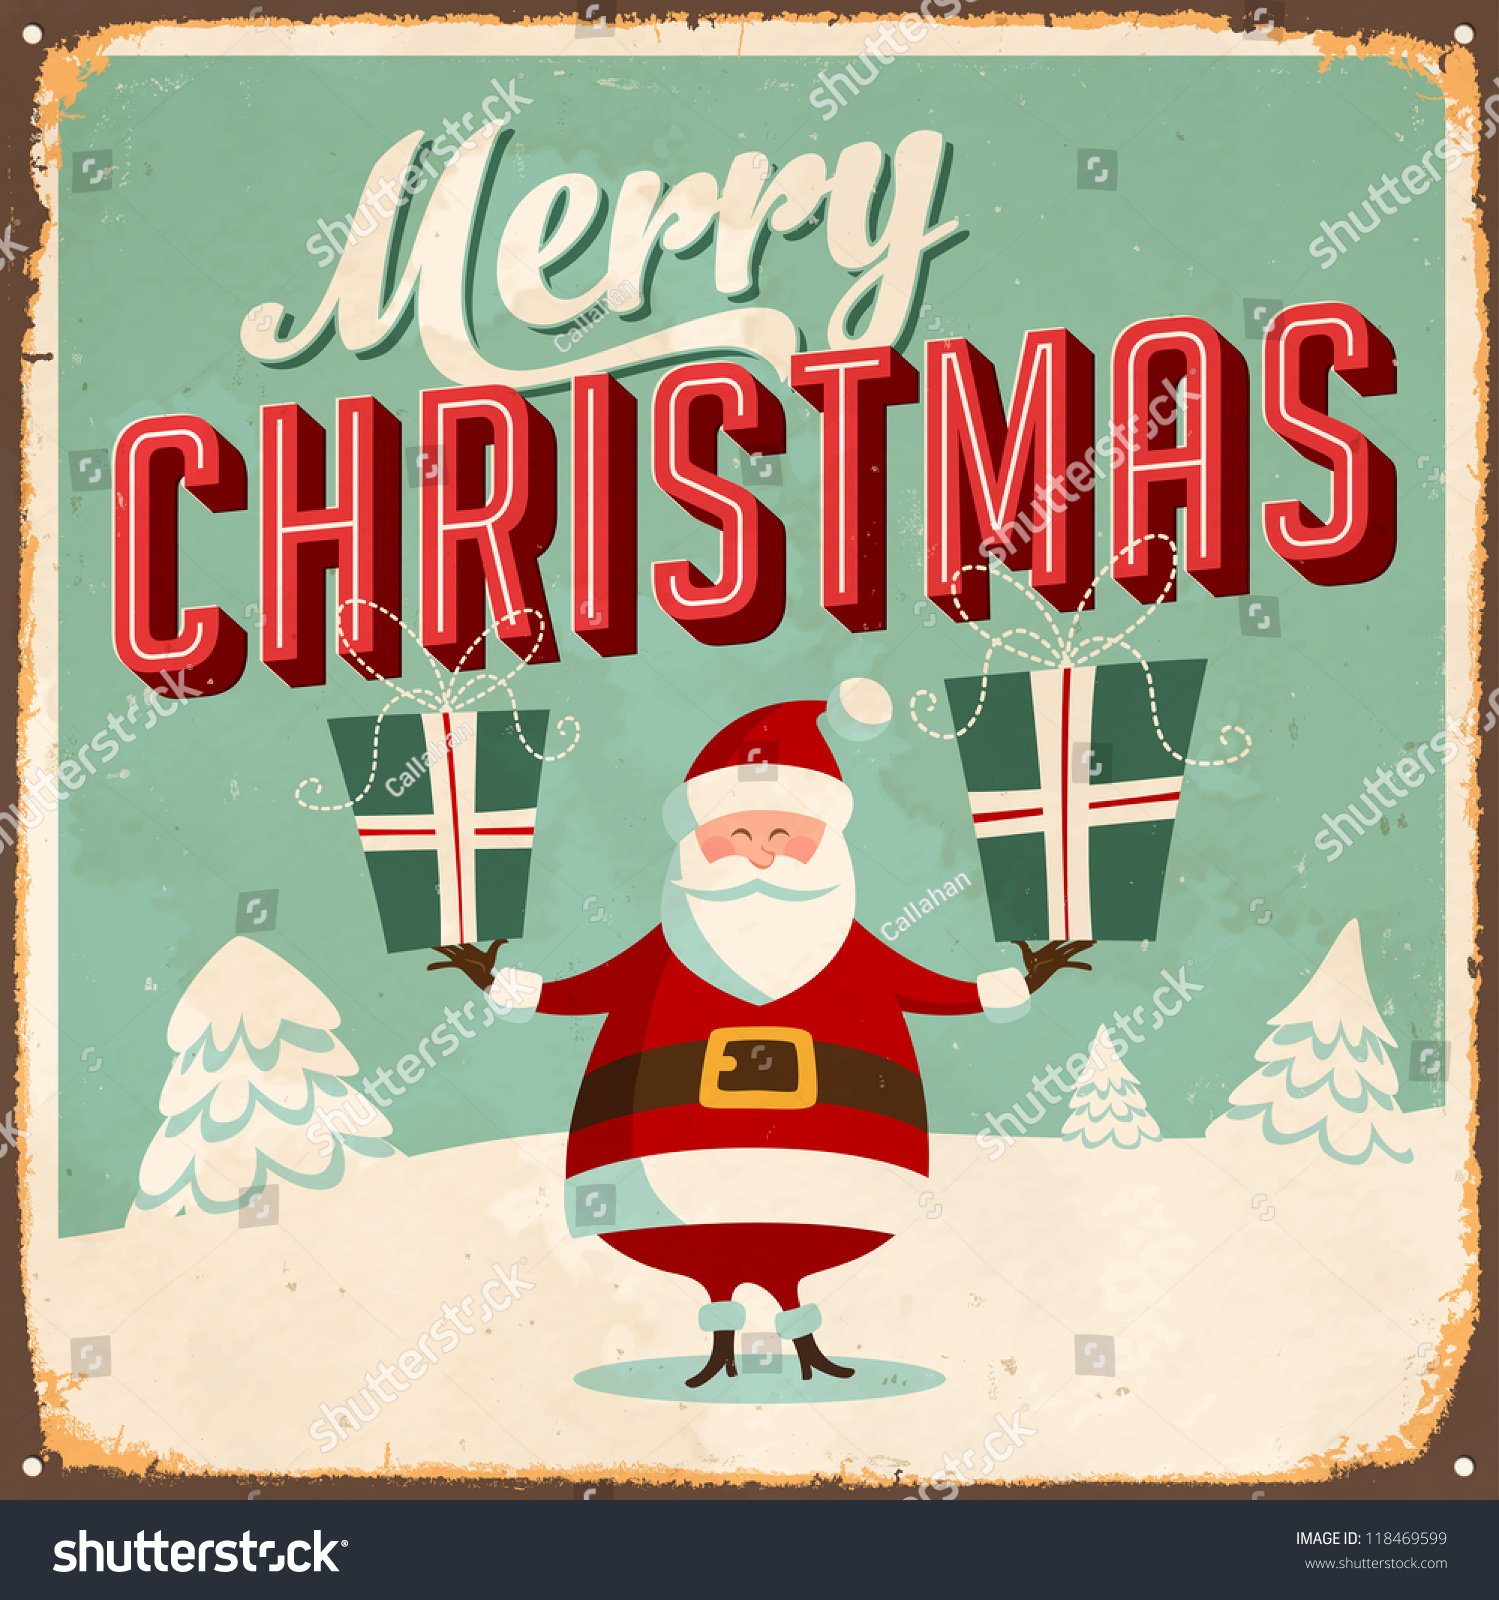 Vintage Metal Sign Merry Christmas JPG Stock Illustration 118469599 ...